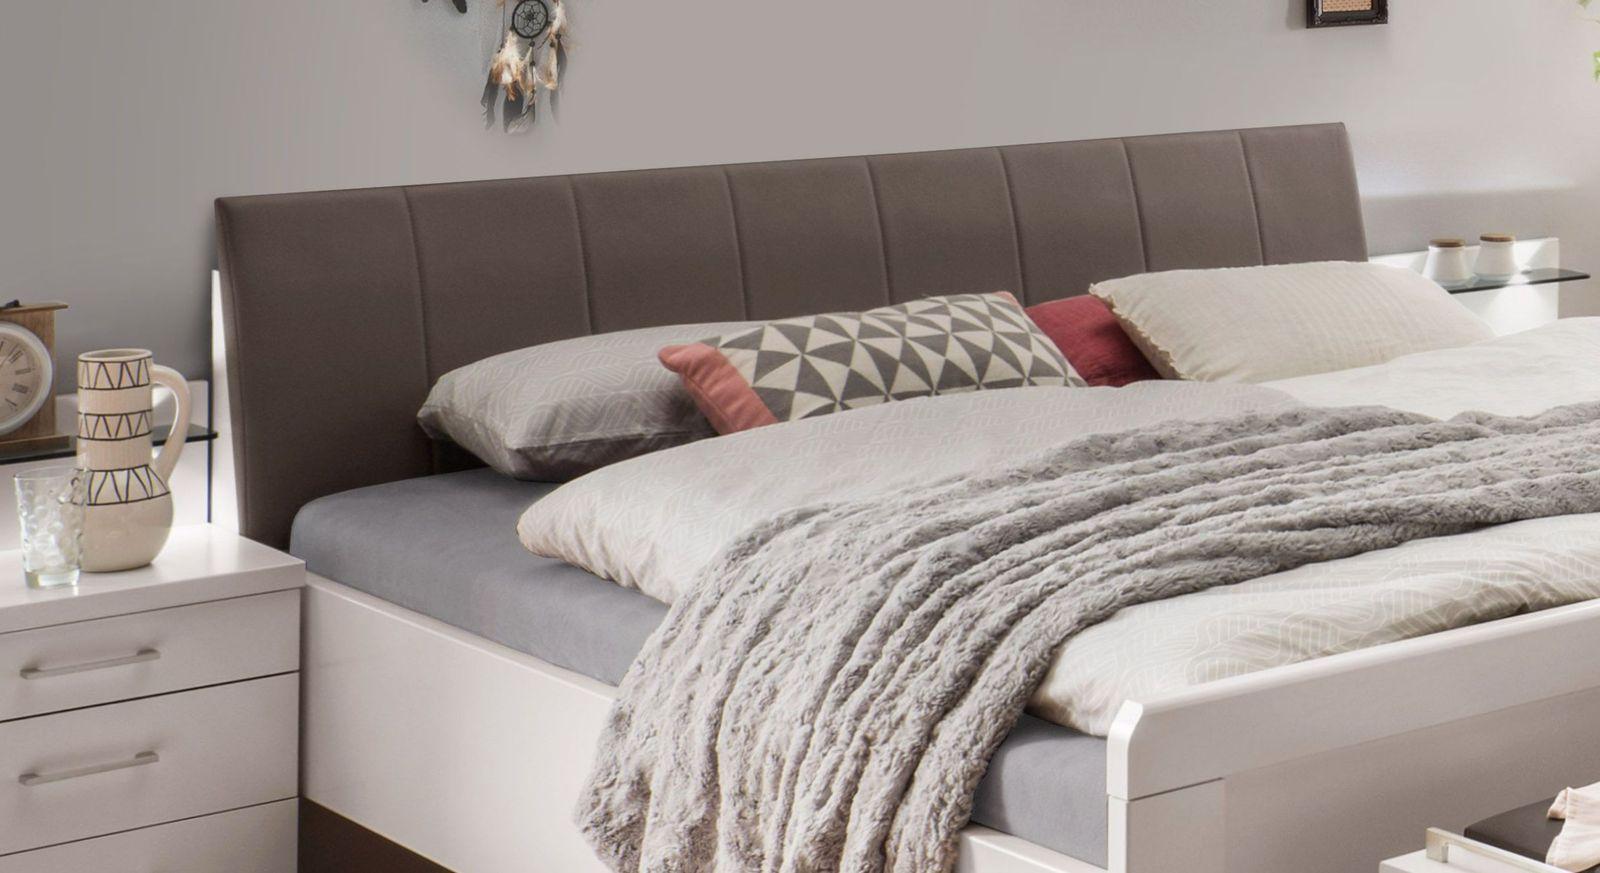 Komfort-Doppelbett Casperia mit havannafarbenem Kunstleder-Kopfteil